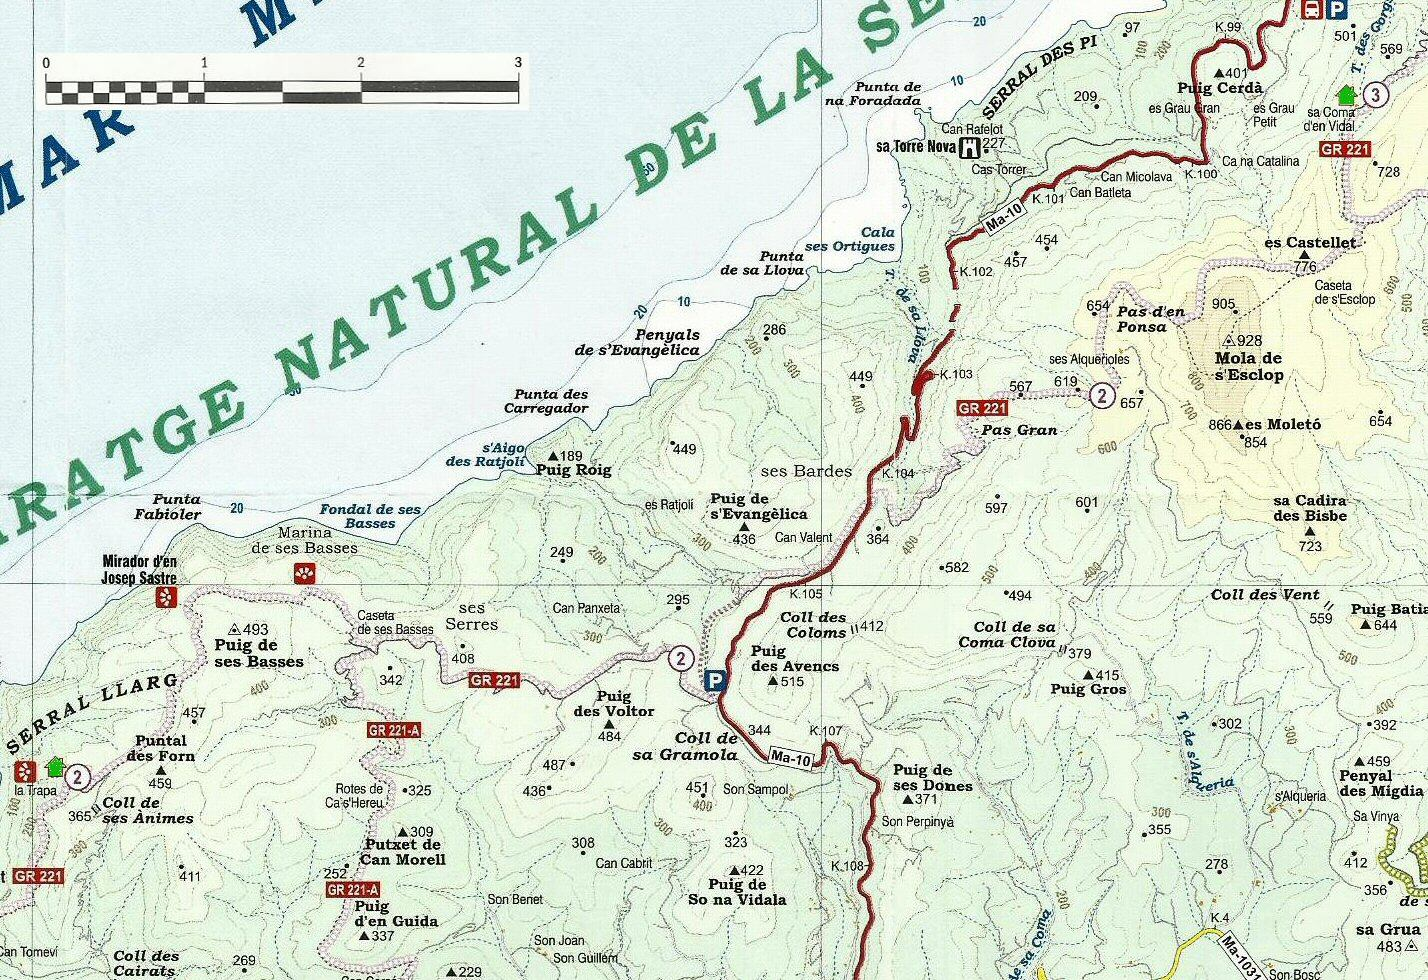 Mallorca cartes du gr 221 mayake - Carte tntsat gratuite ...